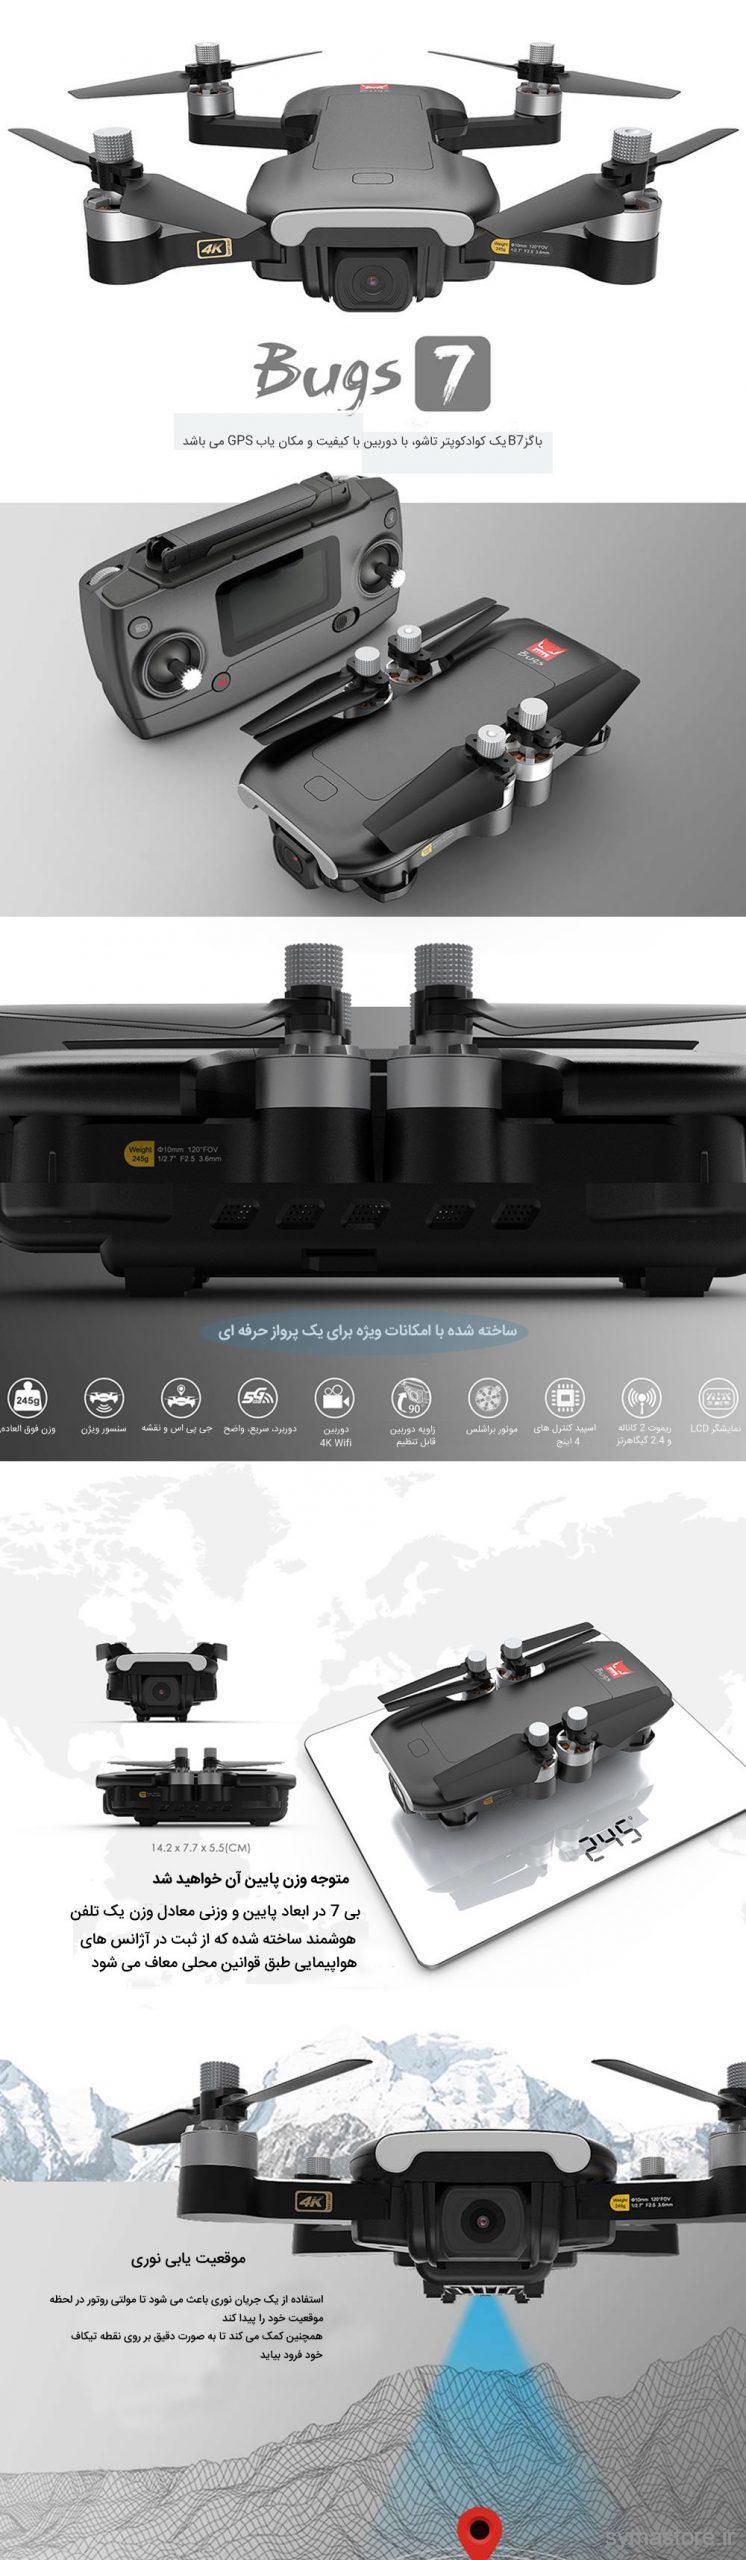 infographic-mjx-bugs-b7